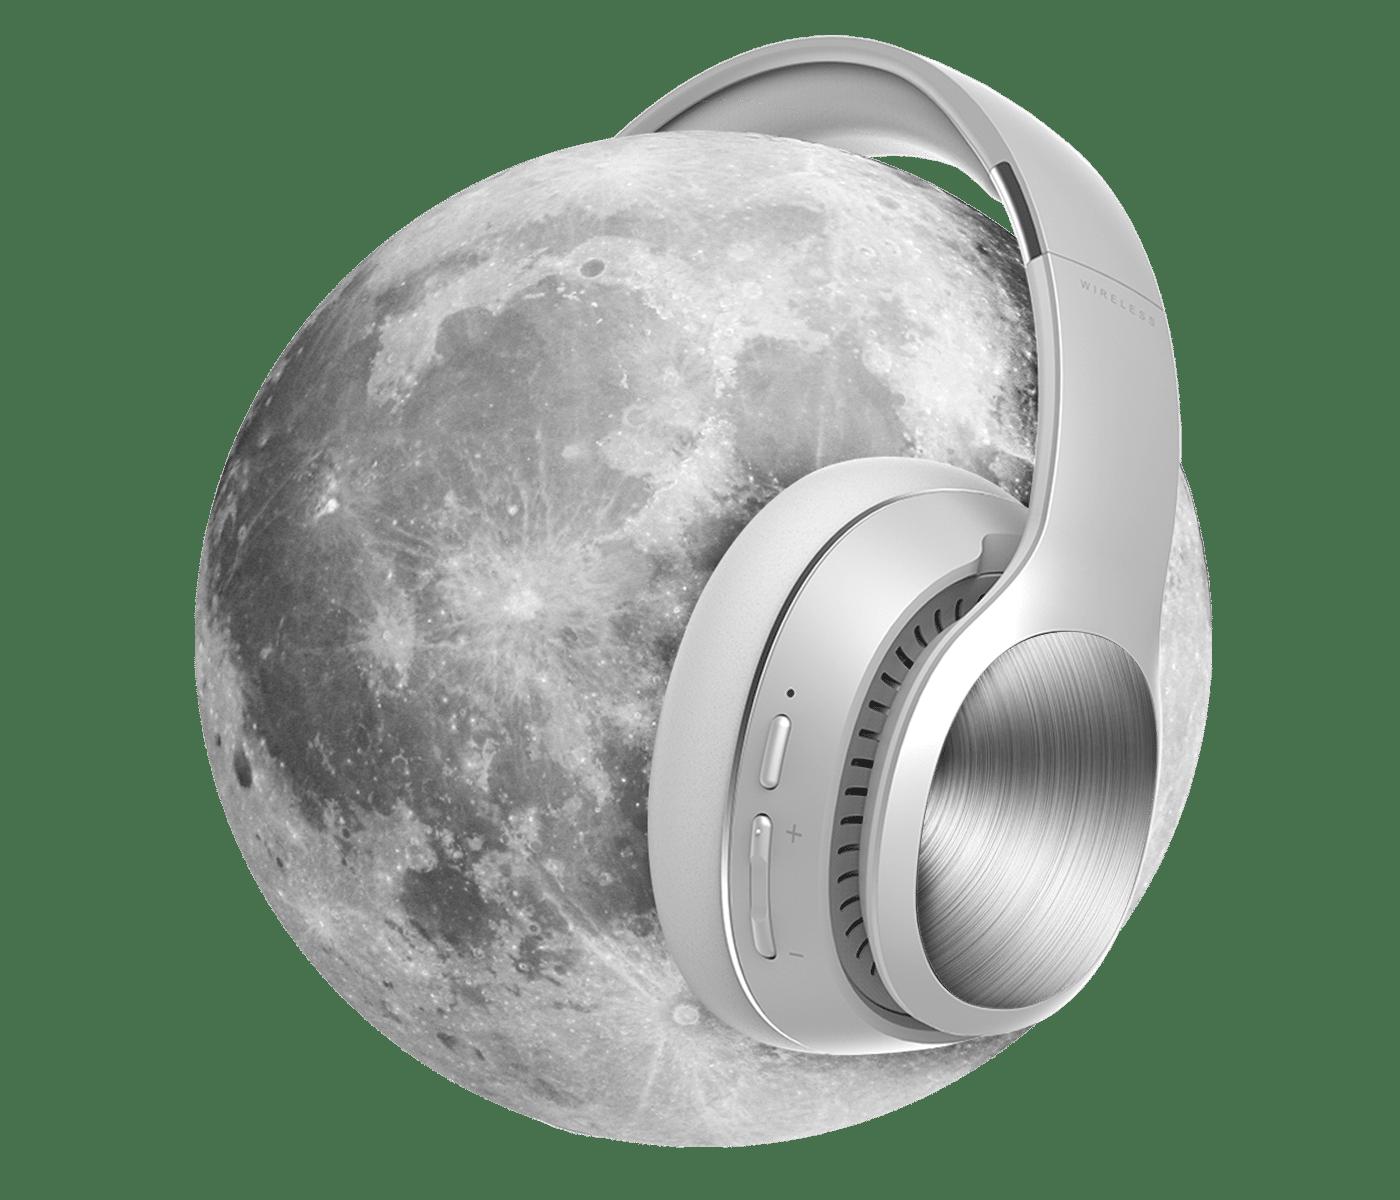 La notte vola programma Radio Kiss Kiss